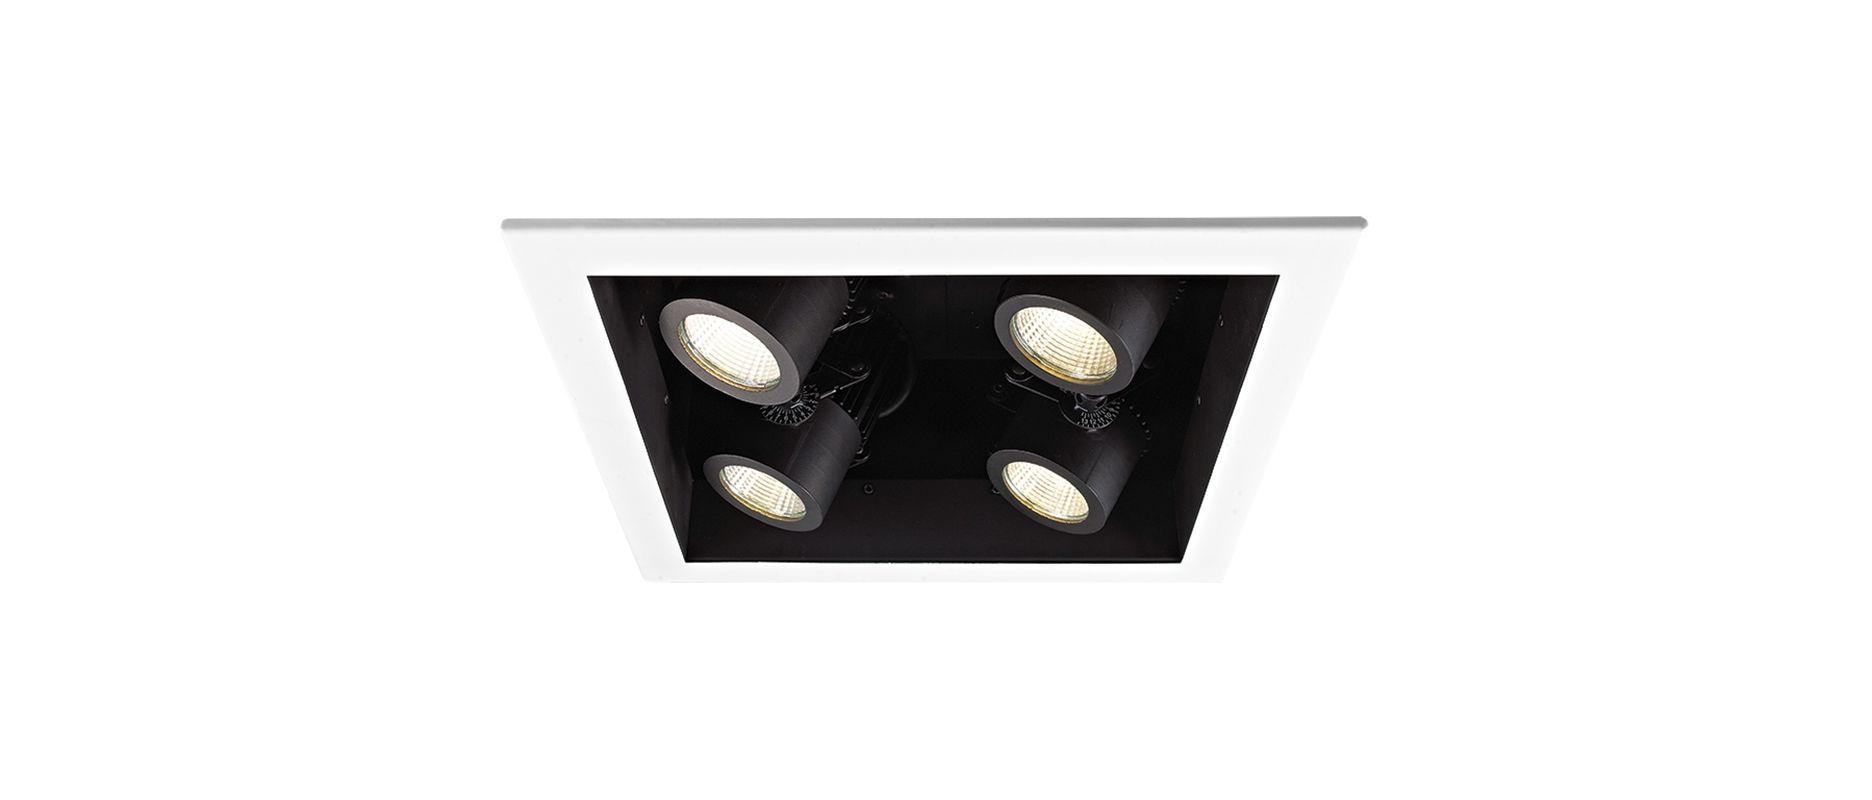 WAC Lighting MT-4LD226N-F40 4 Light Energy Star 4000K High Output LED